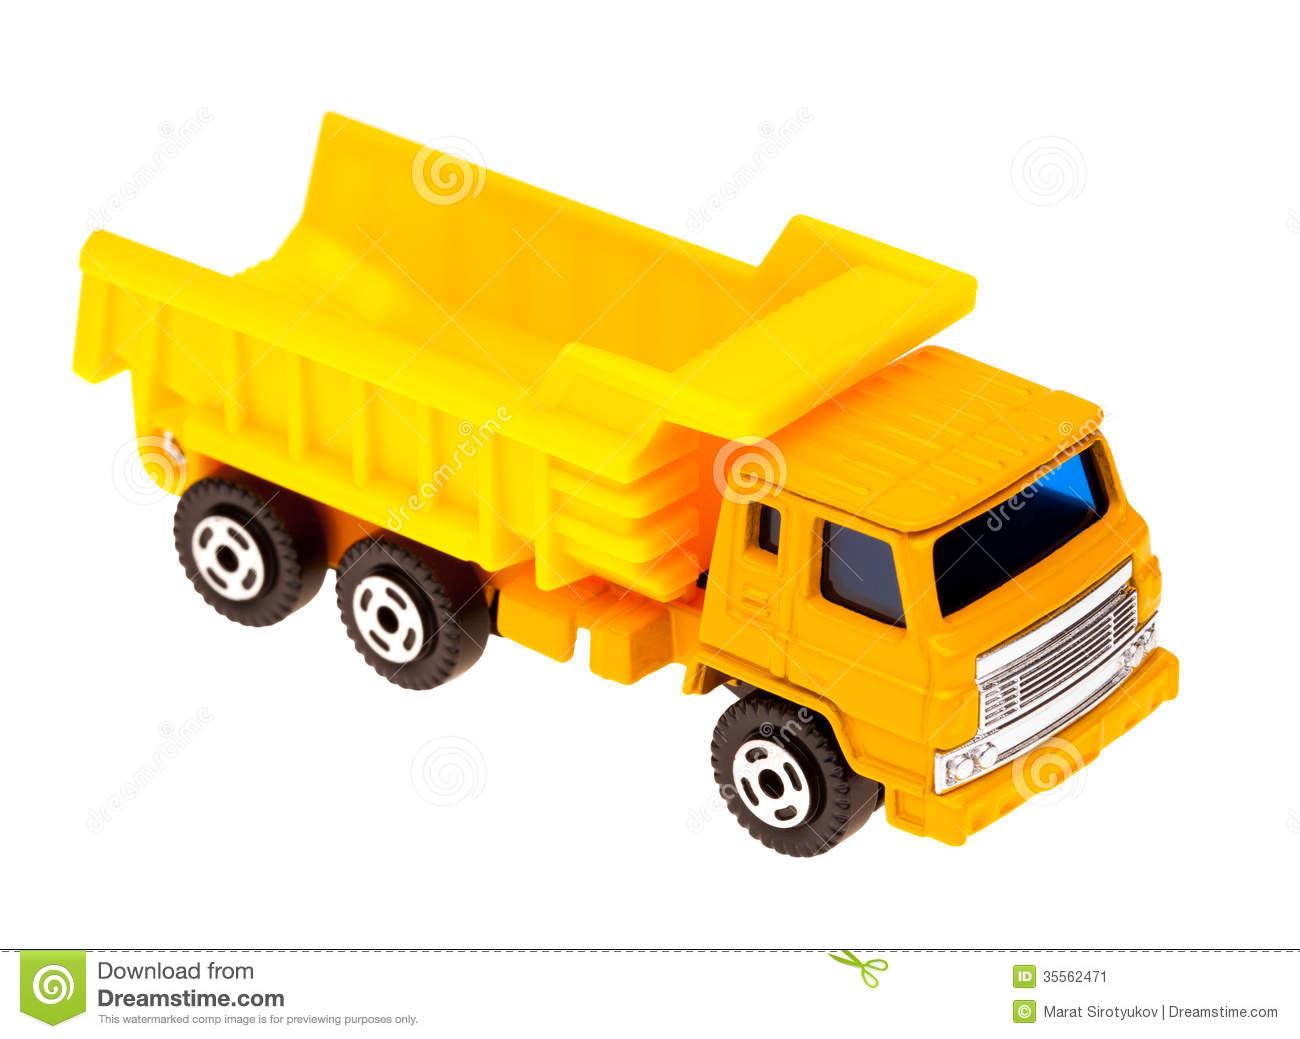 15 Dump Truck Toy Vector Images